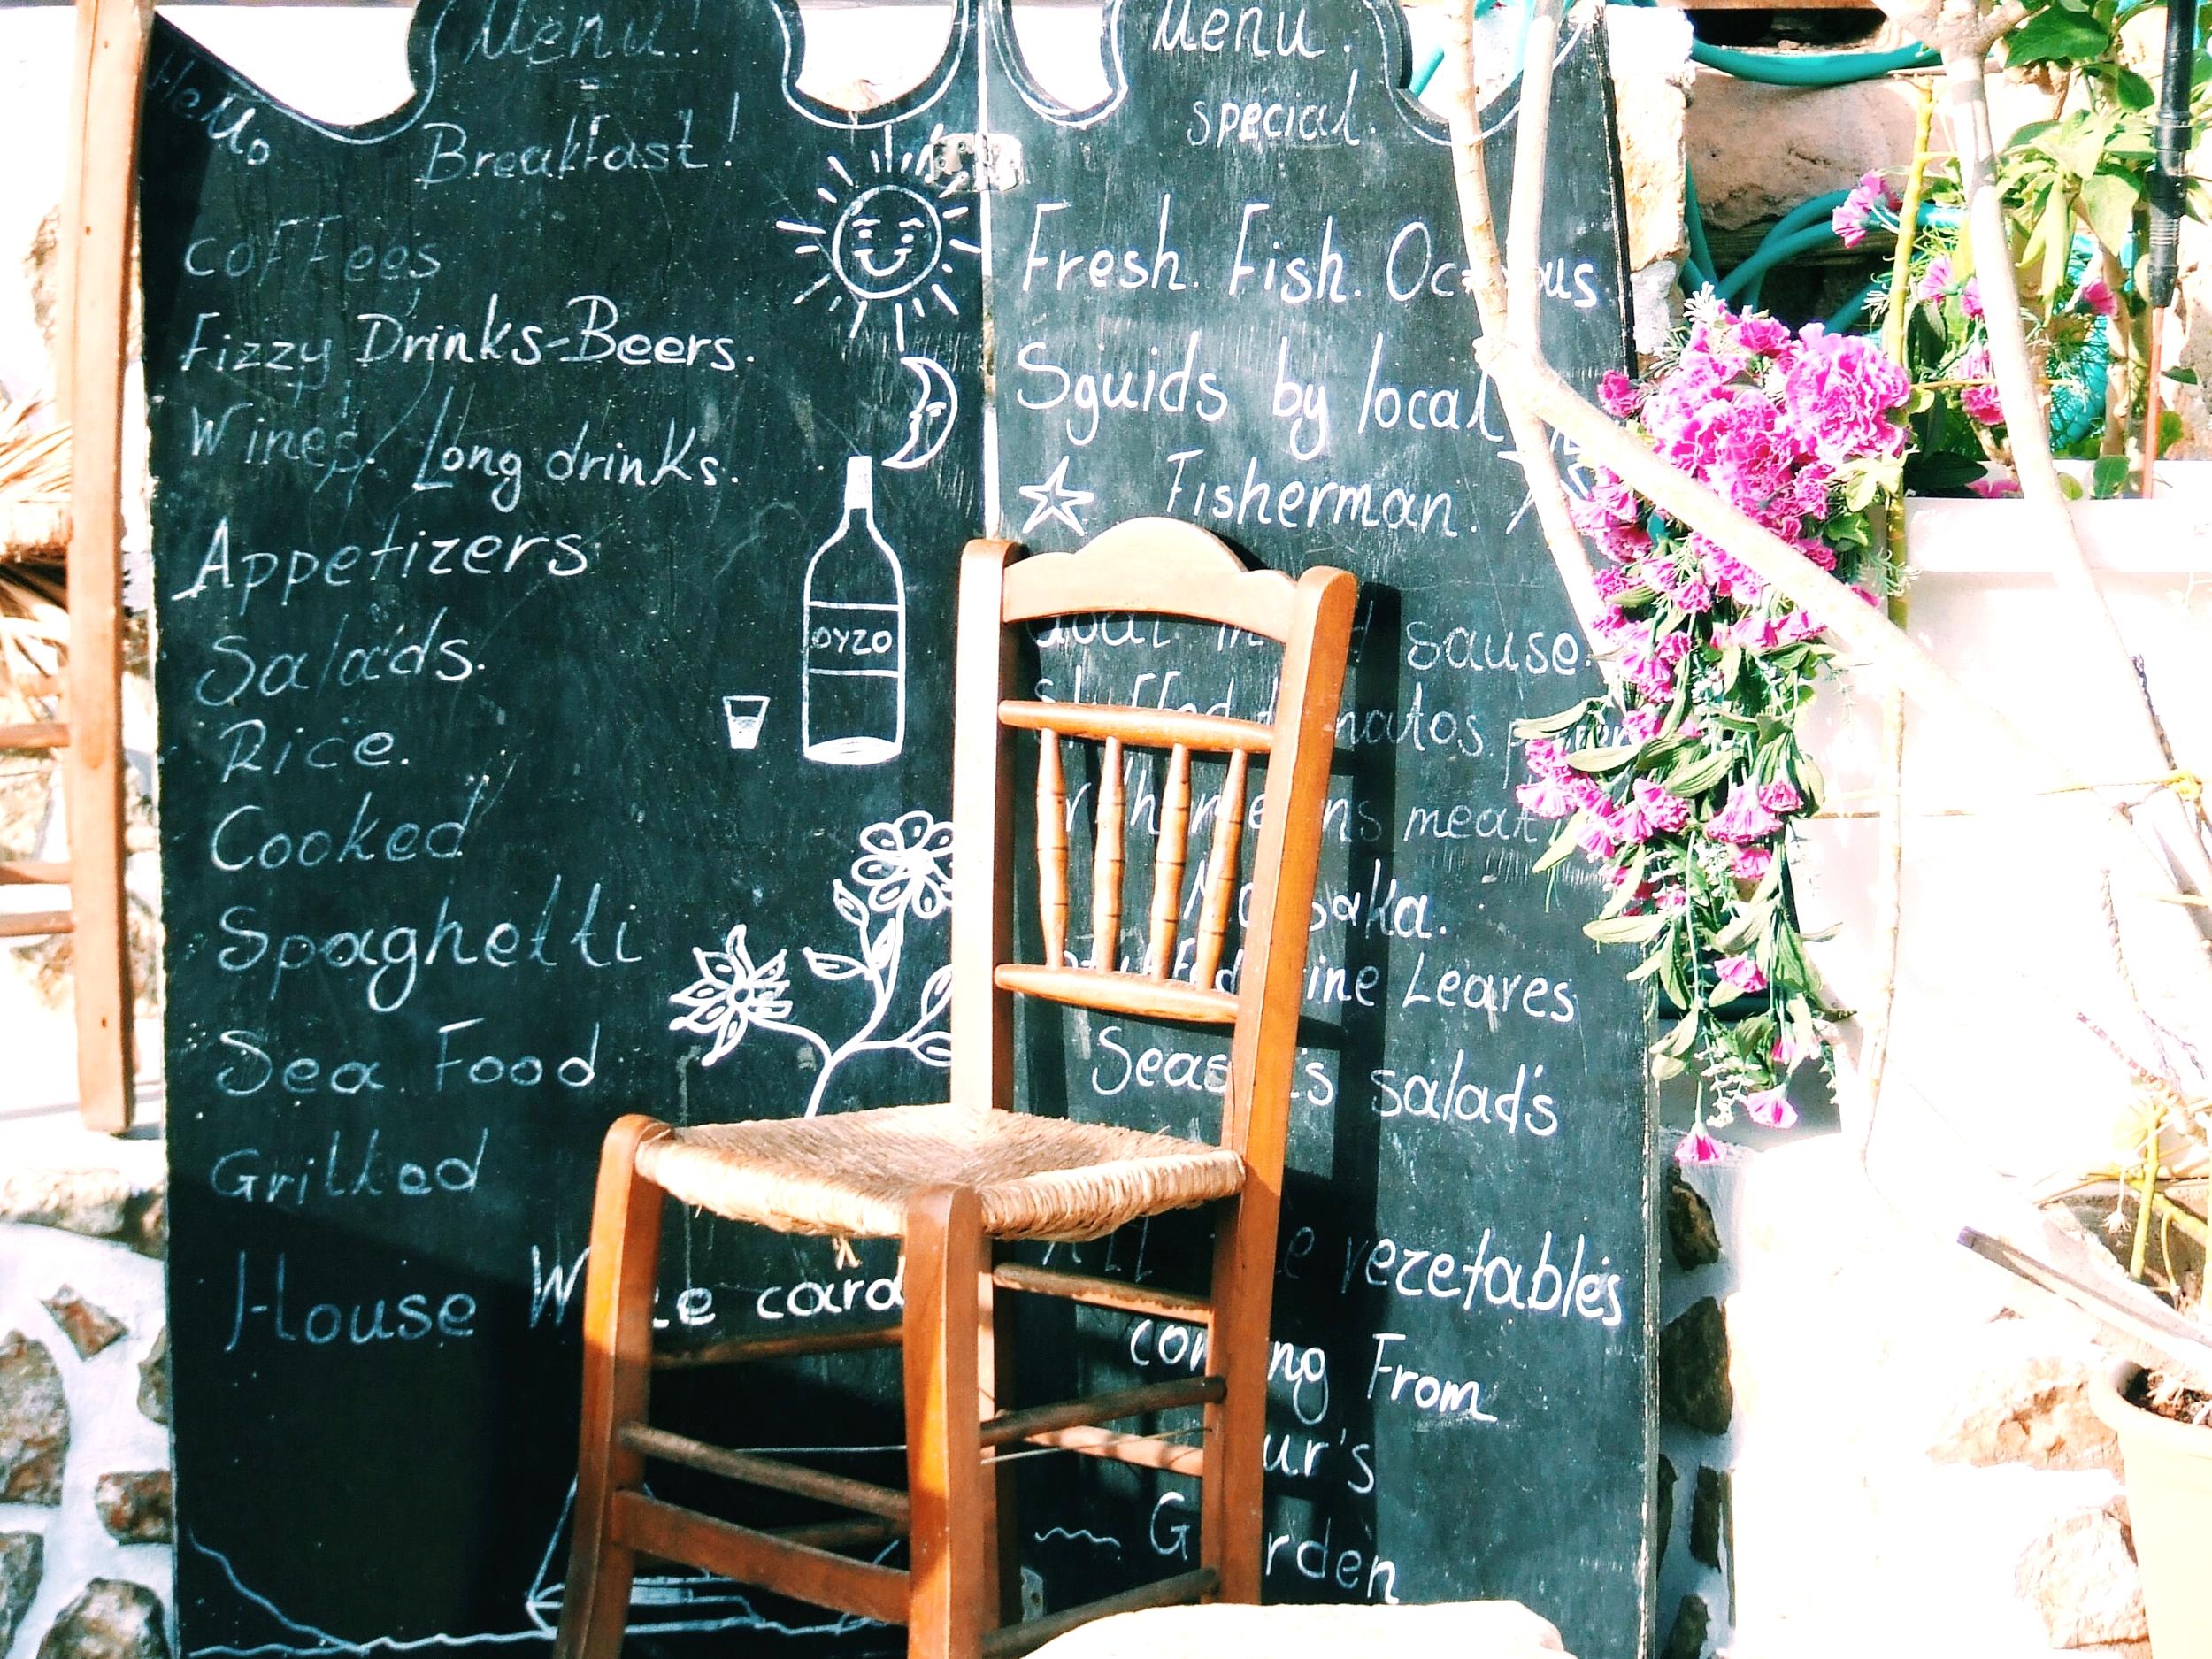 Menu board outside the taverna.